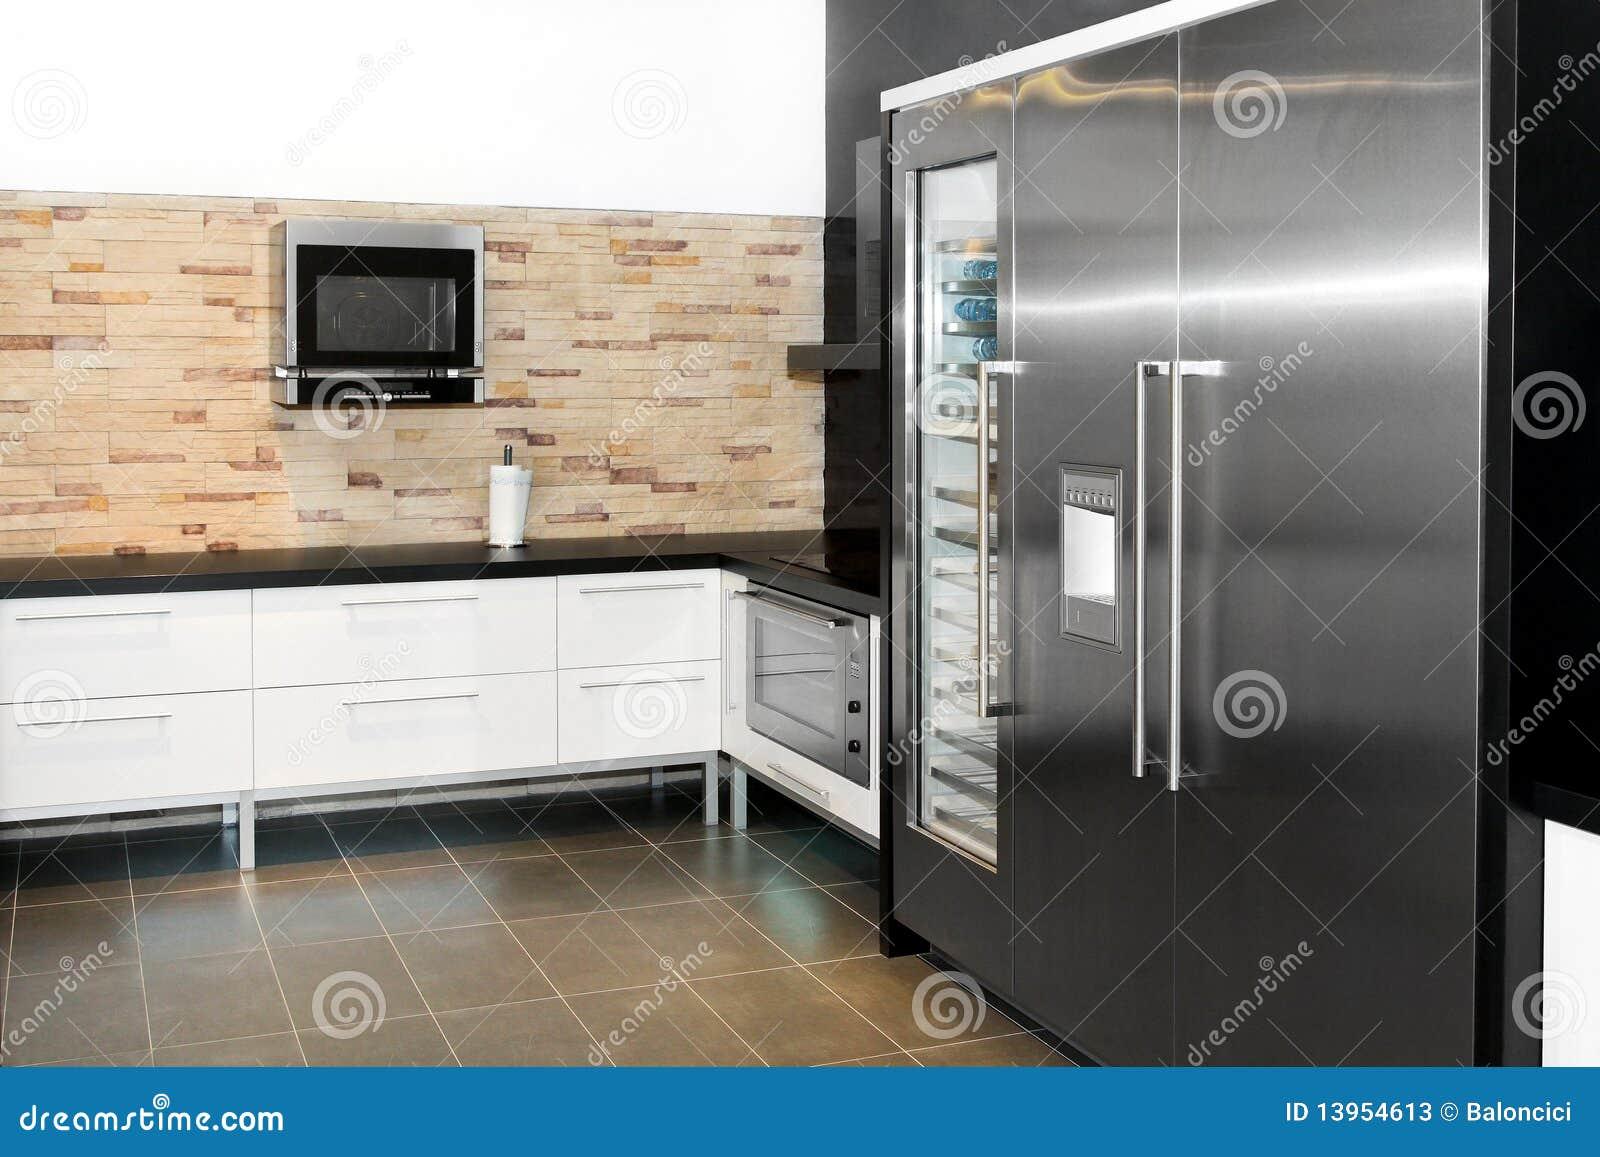 Moderne keuken stock afbeelding afbeelding bestaande uit elektrisch 13954613 - Afbeelding moderne keuken ...